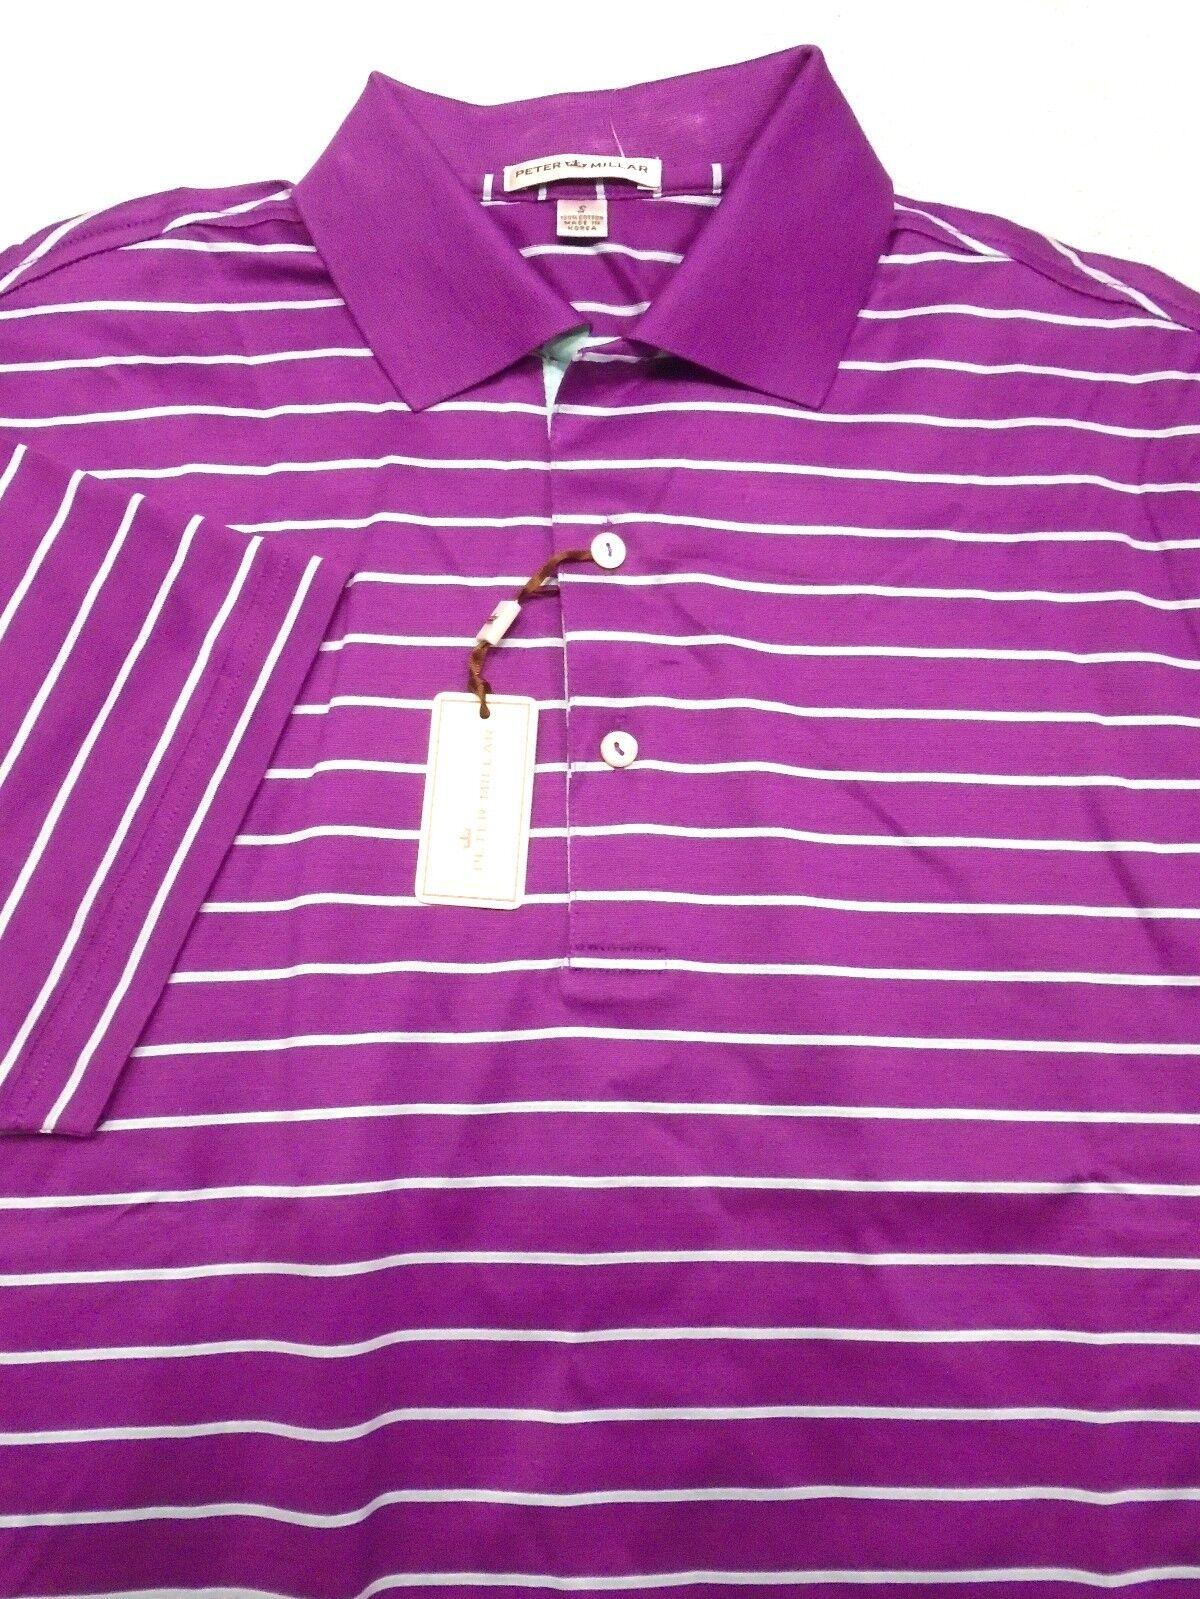 Peter Millar 100% Cotton Beet Purple and bluee Stripe Polo Shirt NWT Small